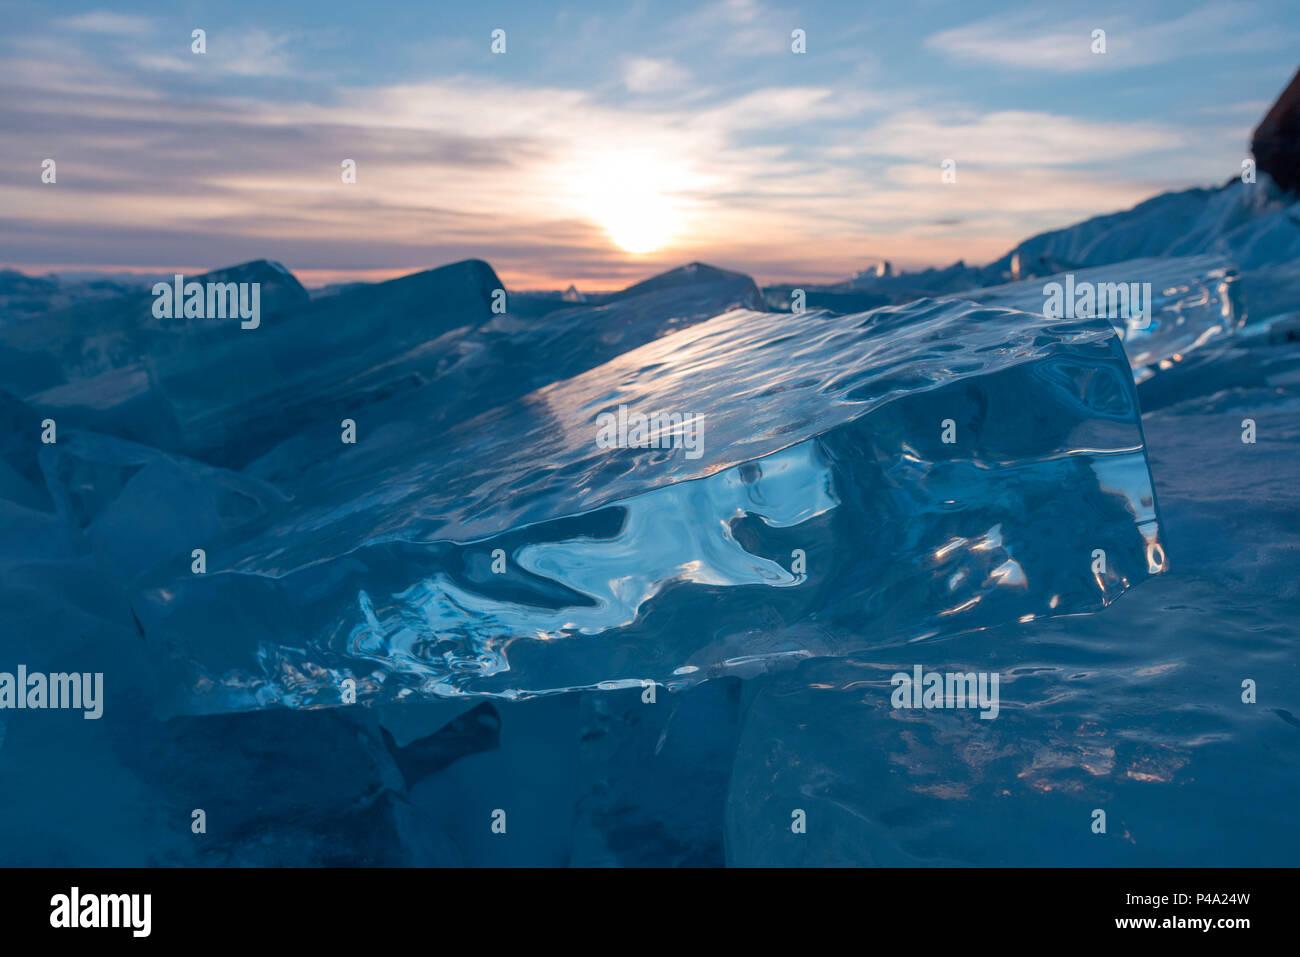 Sun reflections on ice at Lake Baikal, Irkutsk region, Siberia, Russia - Stock Image